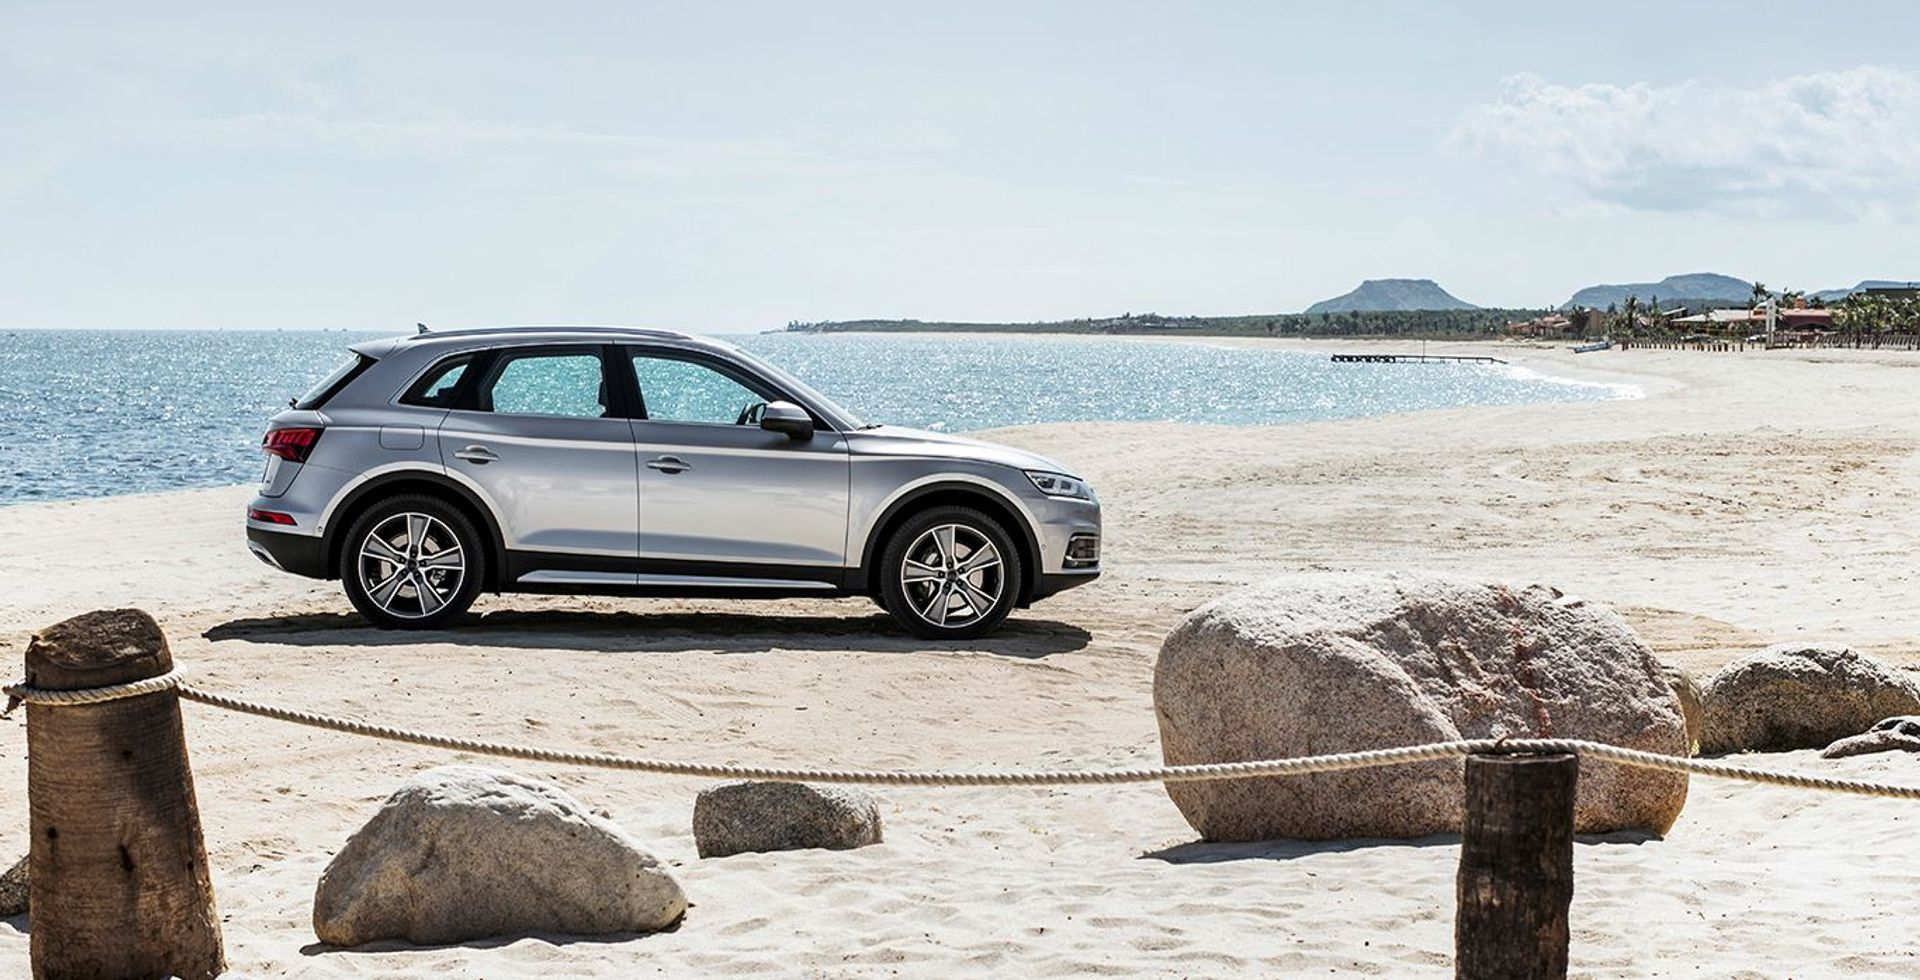 Audi Q5 TFSIe image